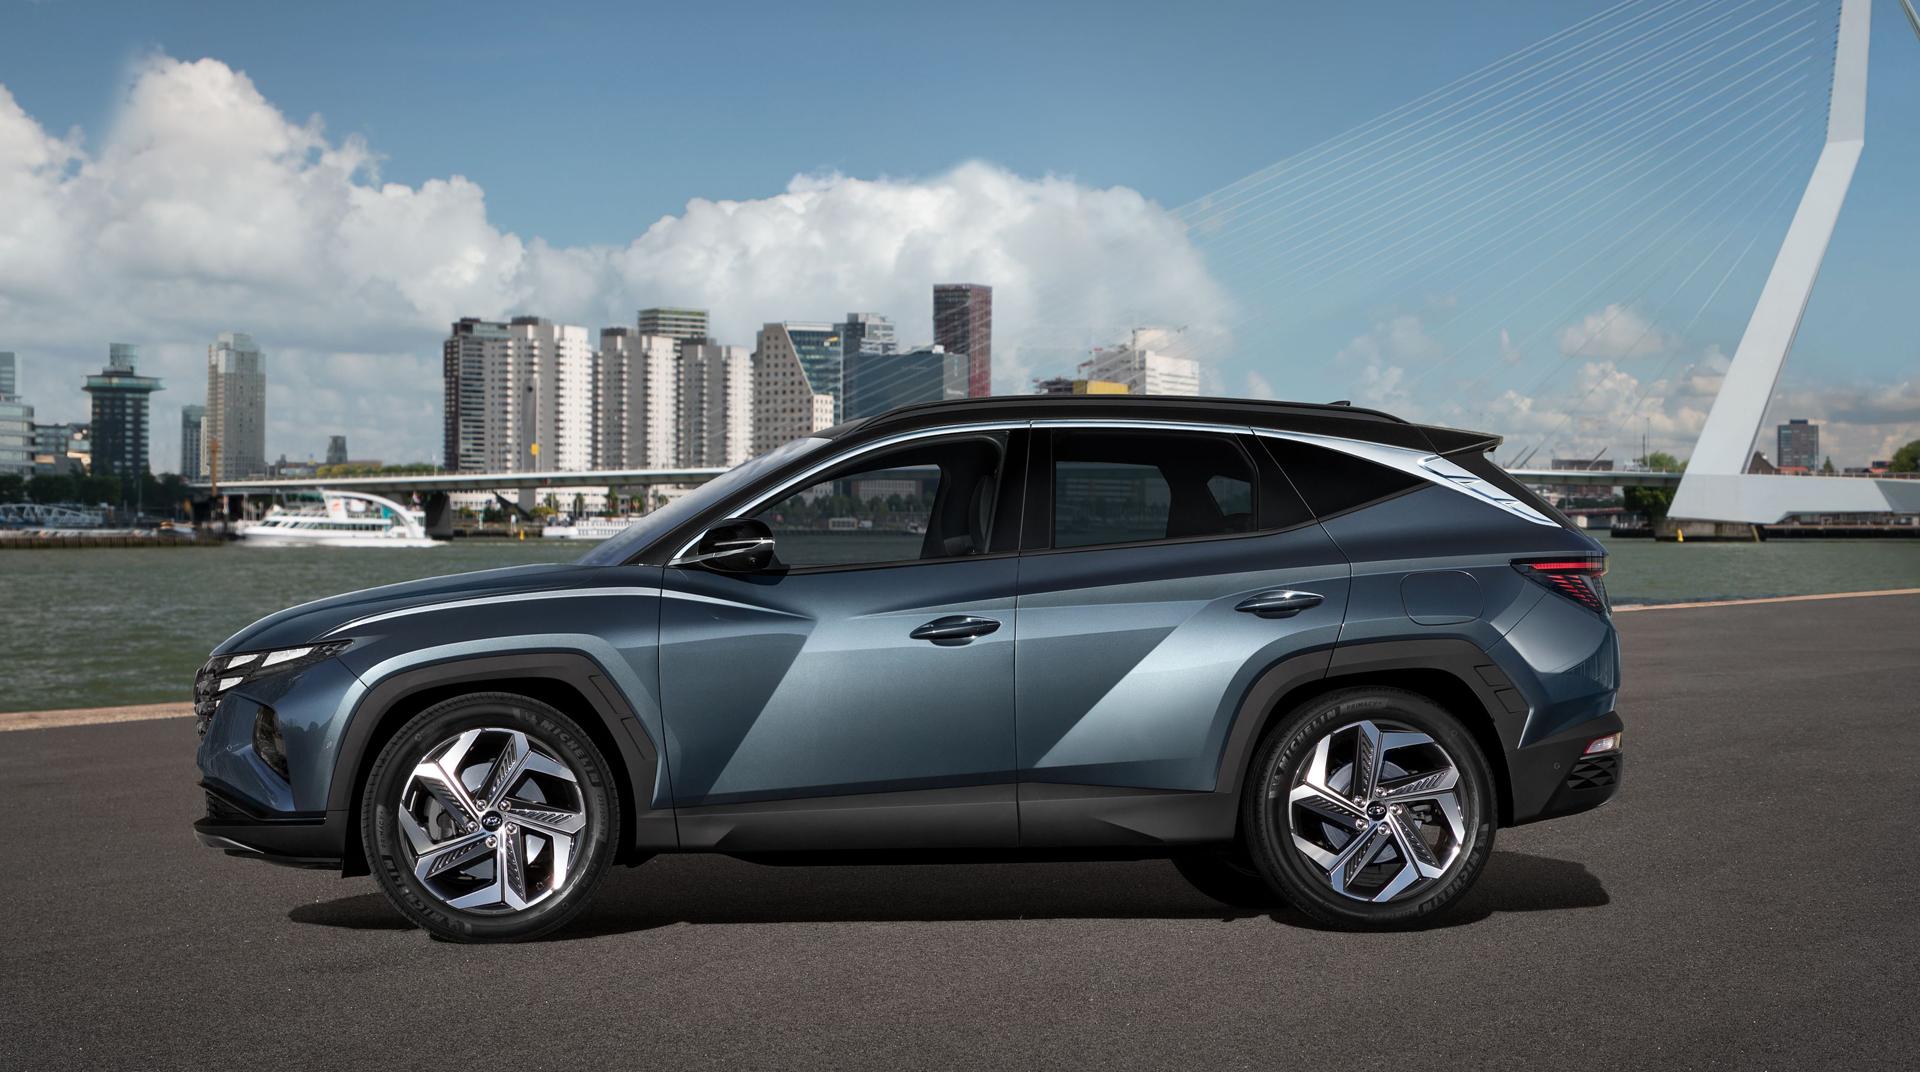 The all new Hyundai Tucson